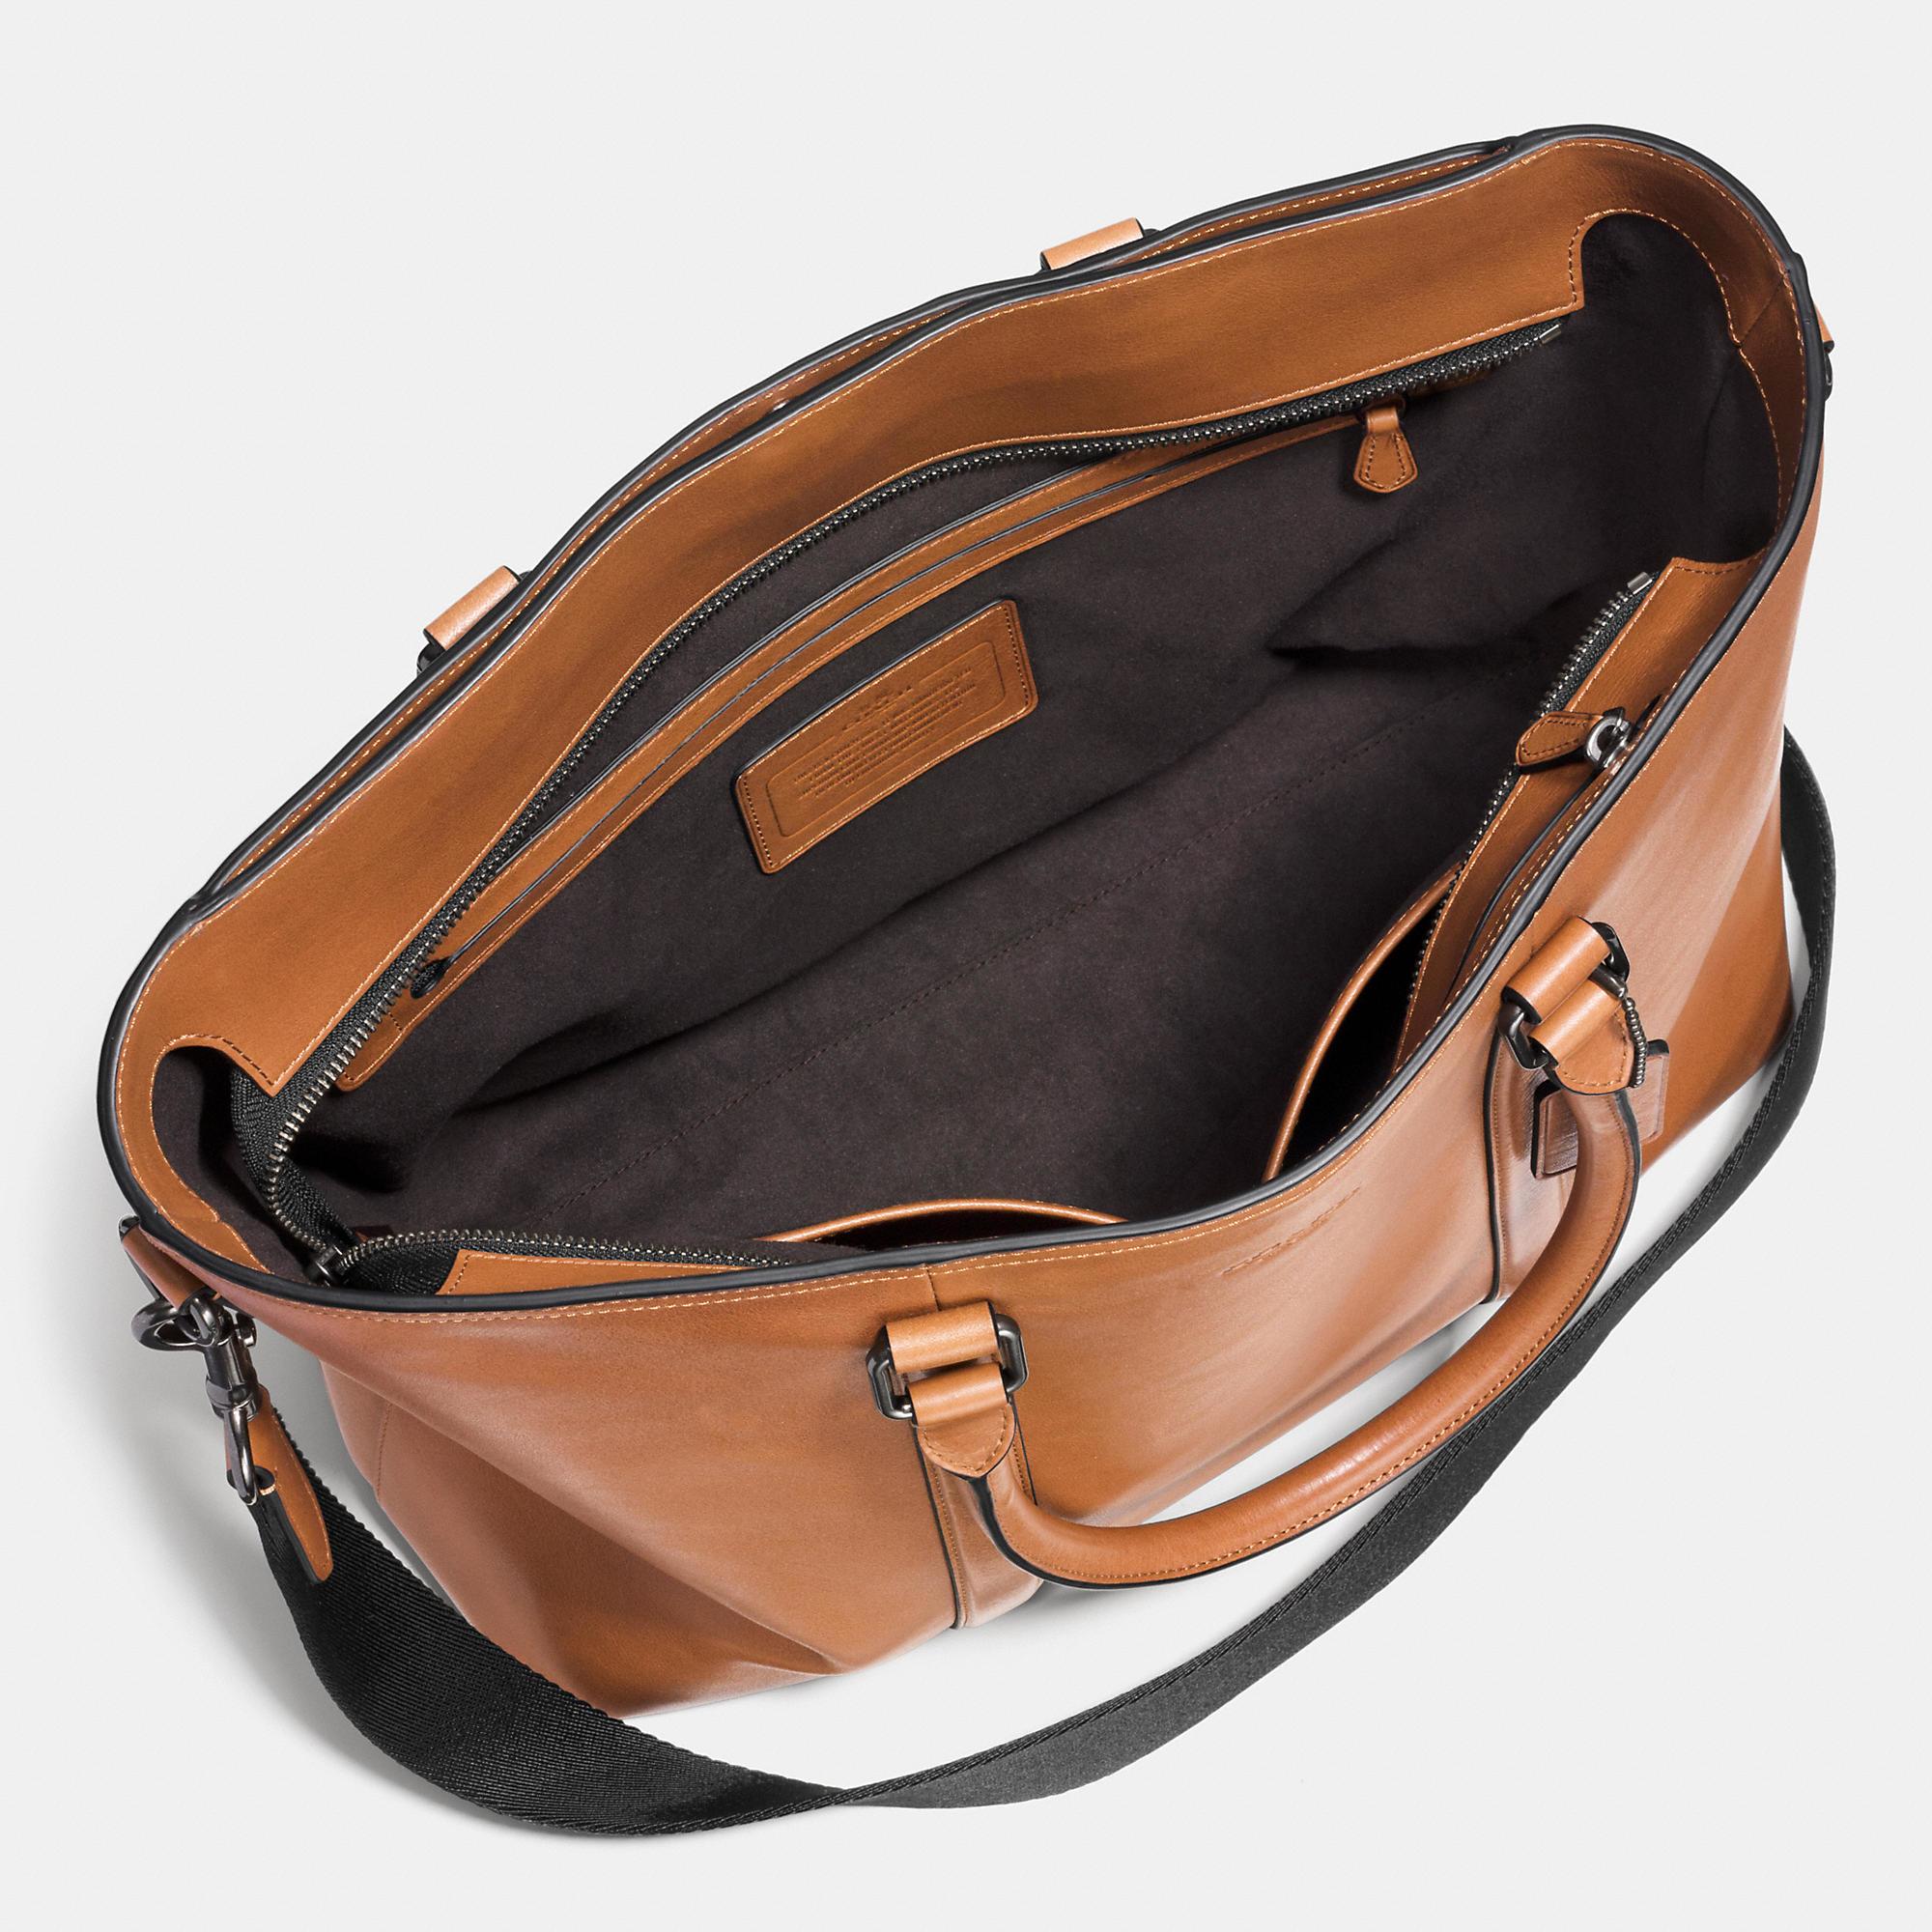 6af40c412 COACH Metropolitan Tote In Sport Calf Leather in Brown for Men - Lyst